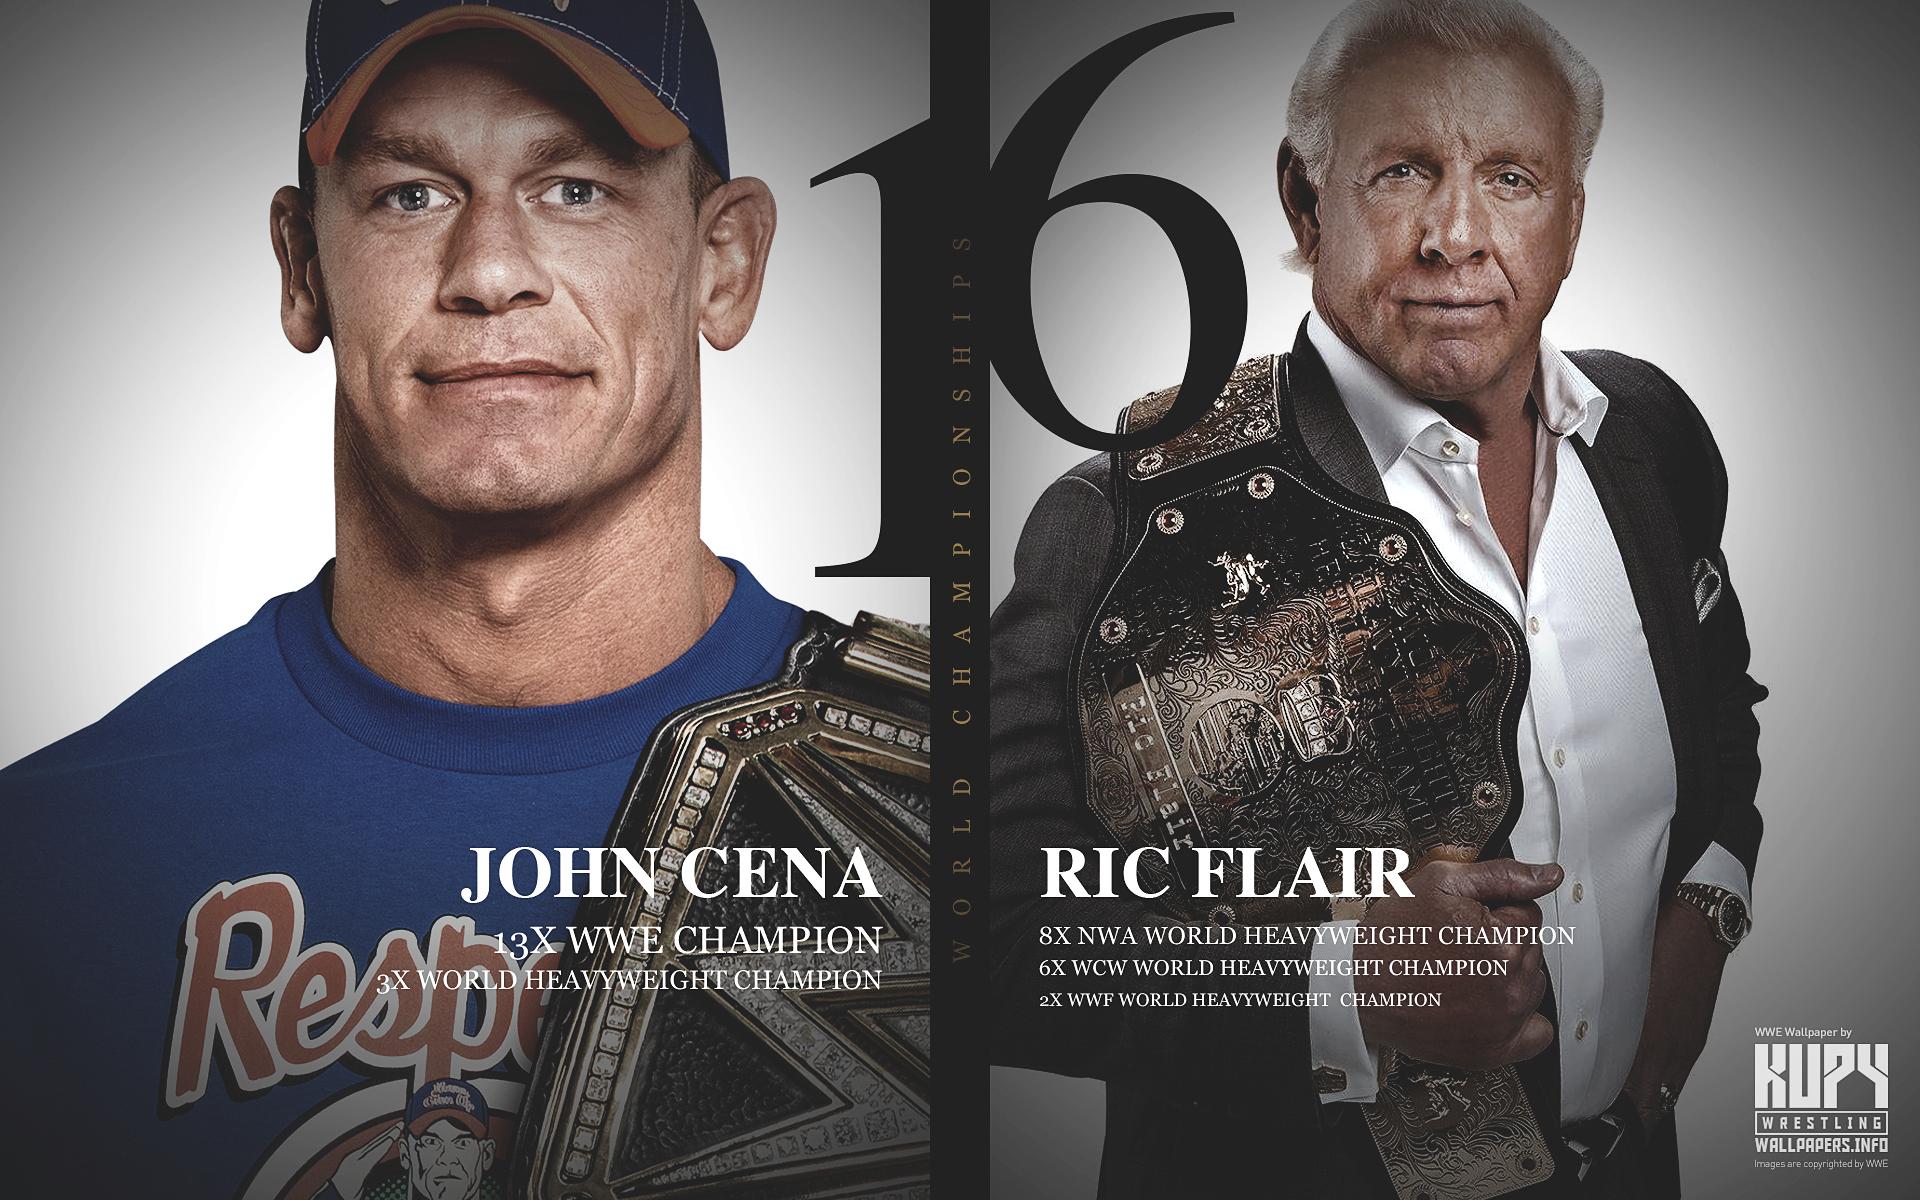 John Cena 16x World Champions Wallpaper 1920×1200 - 16 Time World Champion Ric Flair , HD Wallpaper & Backgrounds